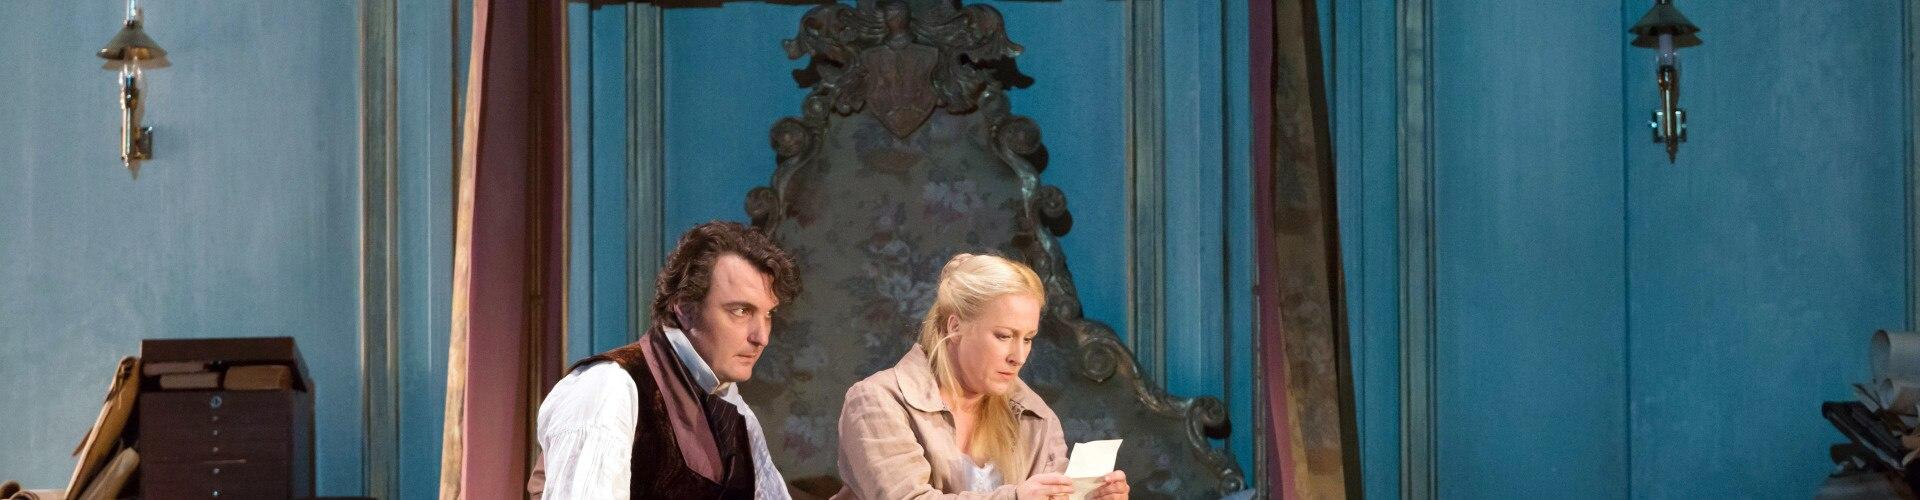 Watch Lucia Di Lammermoor Online